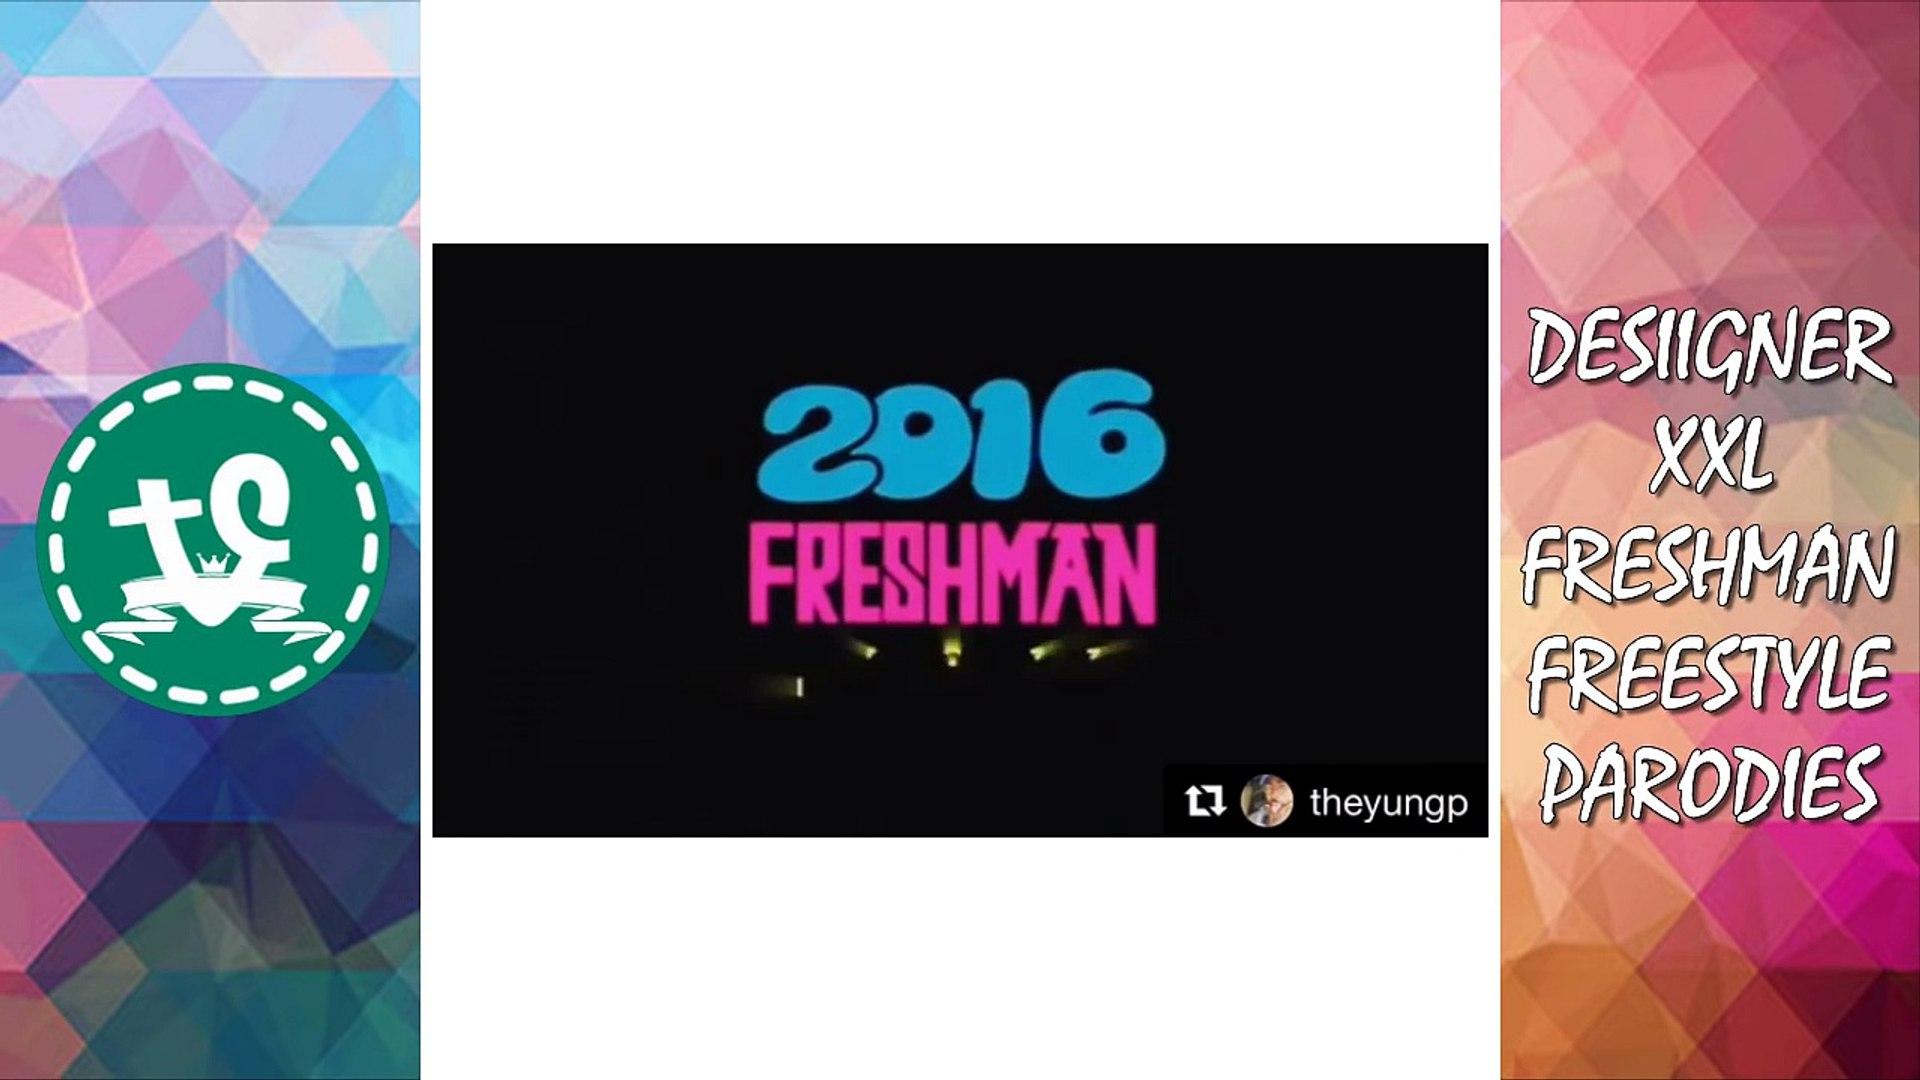 [ultimate] Desiigner Xxl Freshman Freestyle Parodies Compilation (2016)